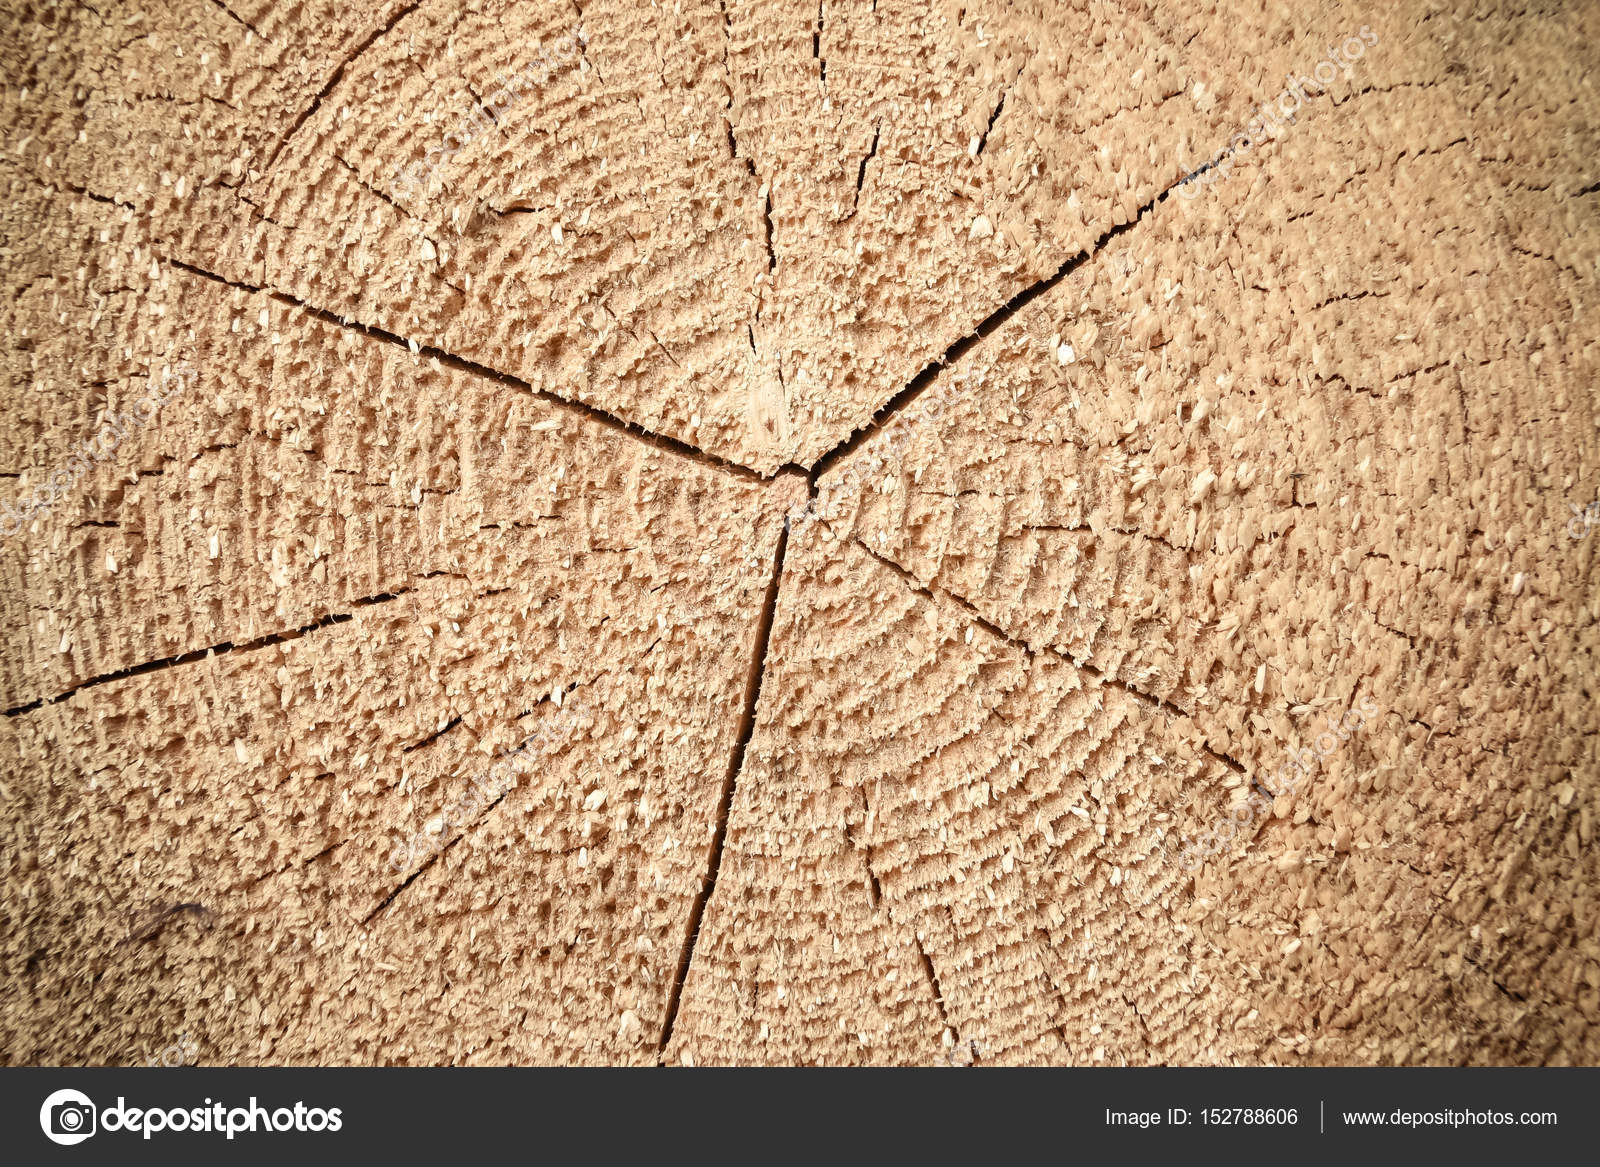 Textura de madera, corte de troncos — Foto de stock © kulkann #152788606